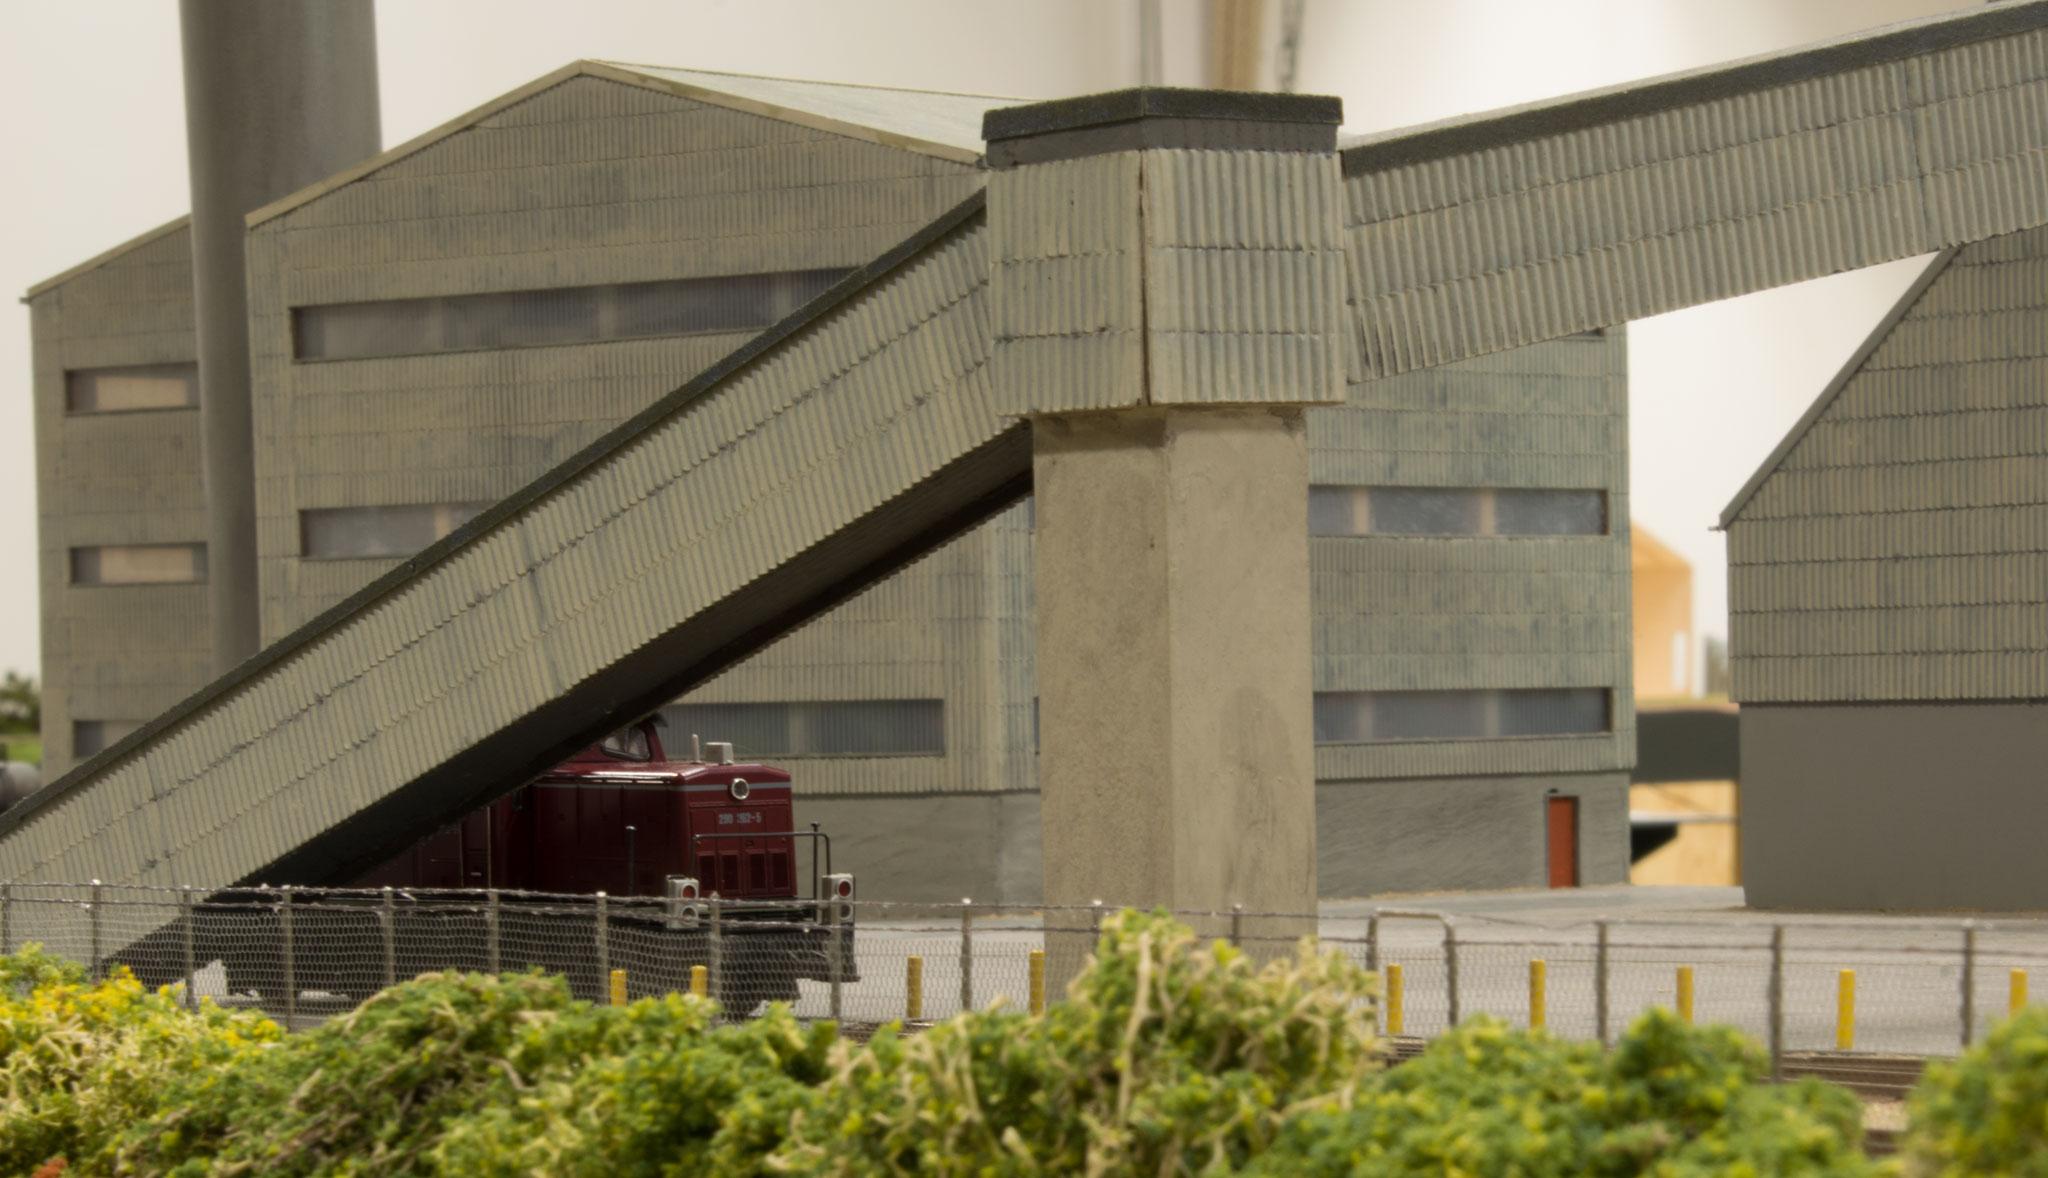 Fabriksbygninger og en enkelt maskine på det store Superfos-anlæg